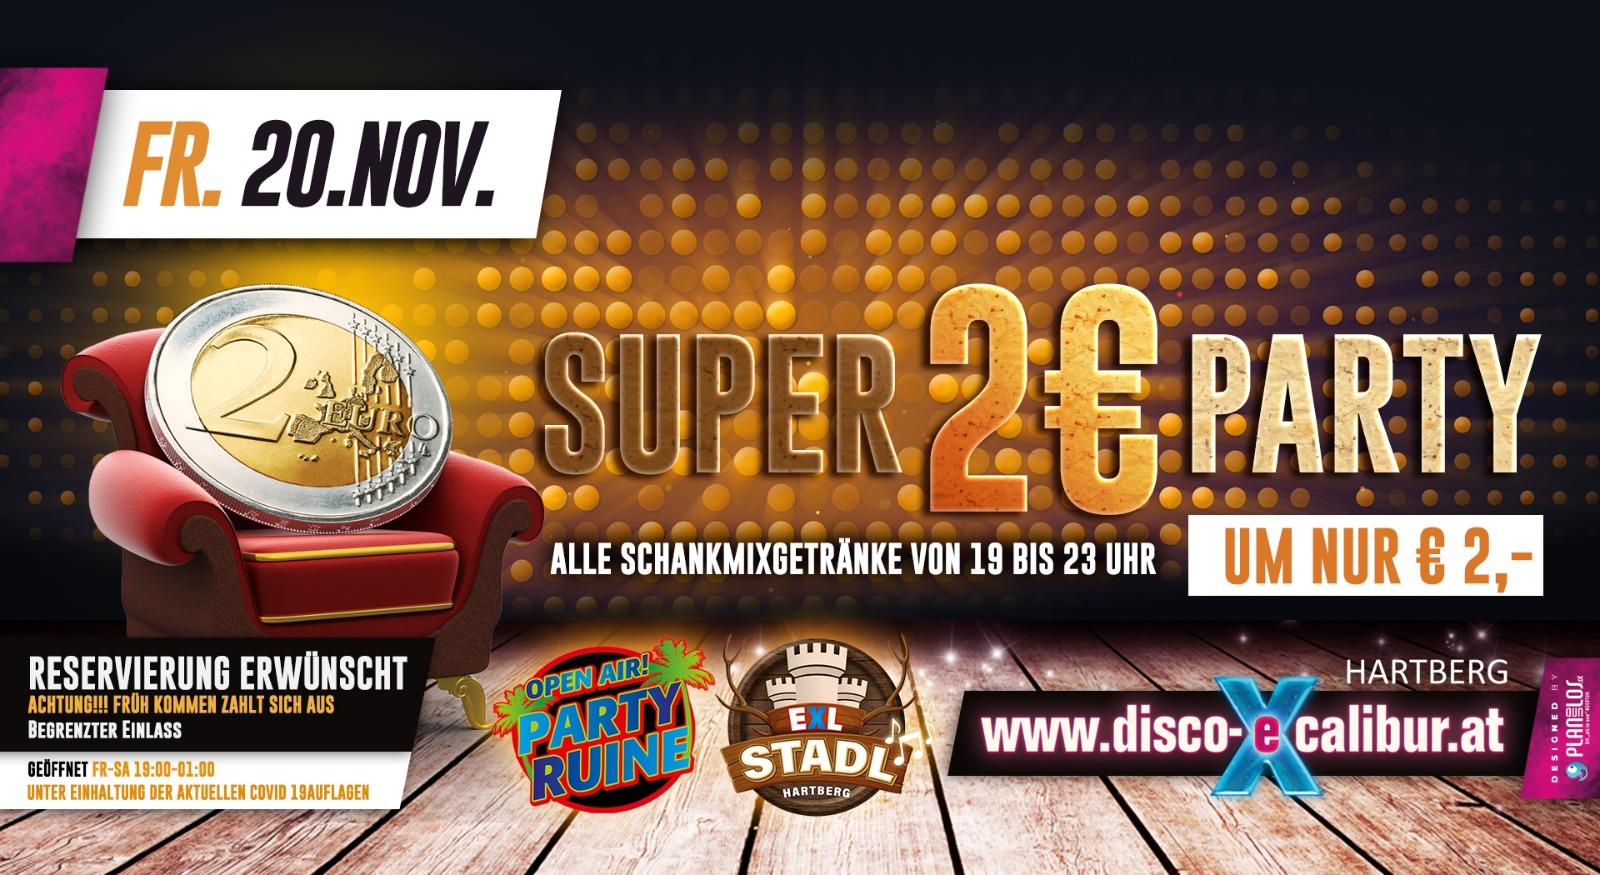 SUPER 2 EURO Party